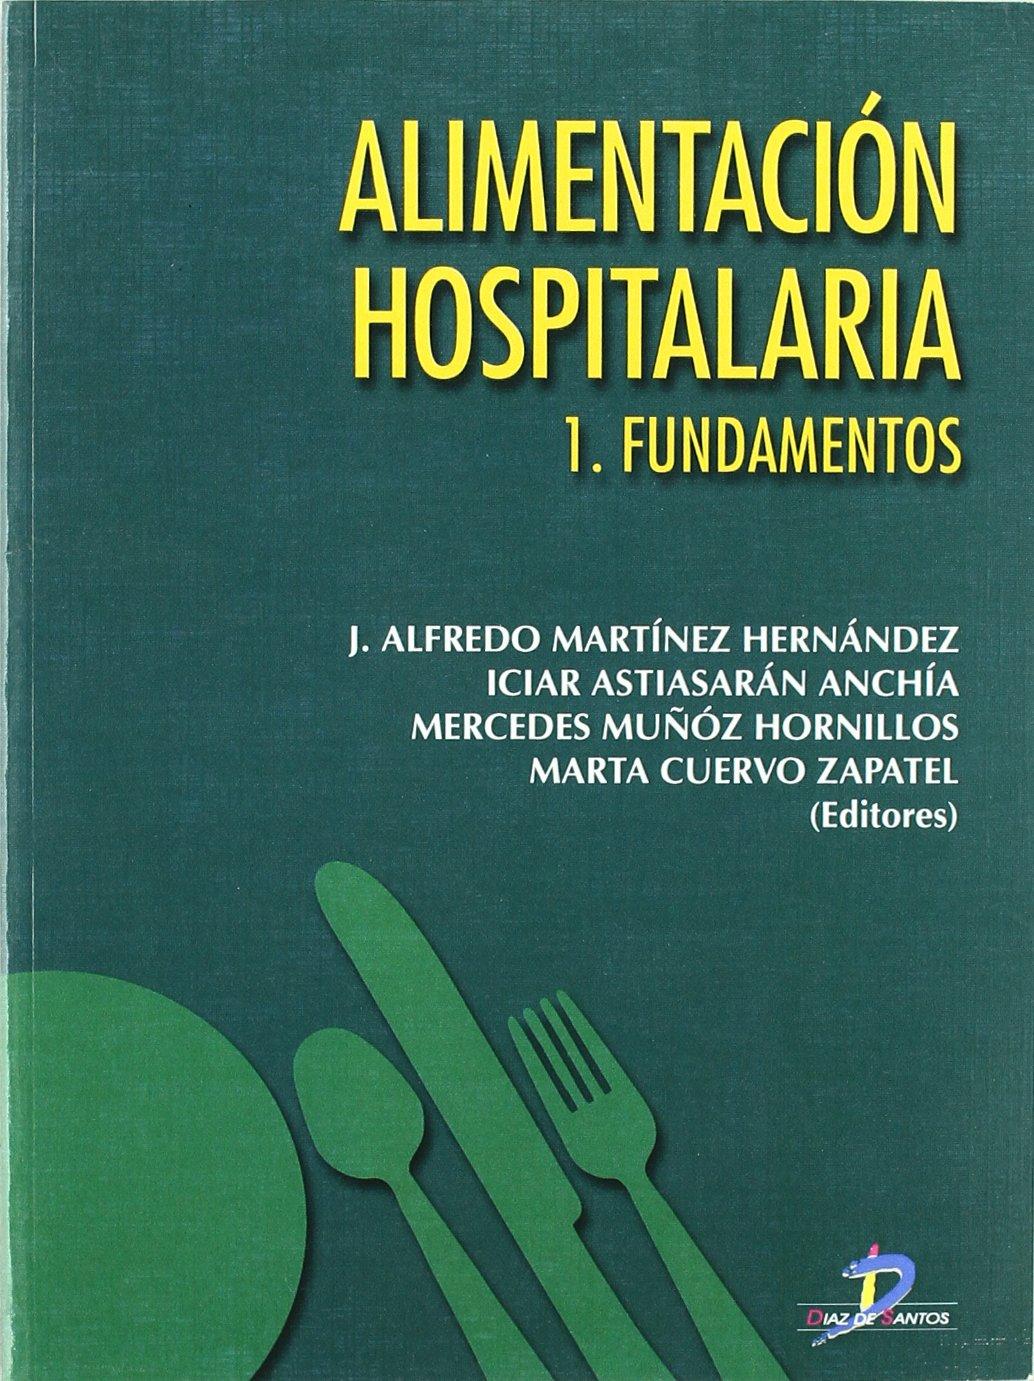 Iciar Astiasarán Anchía, Mercedes Muñóz Hornillos, Marta Cuervo Zapatel Alfredo J. Martinez Hernandez: 9788479786083: Amazon.com: Books